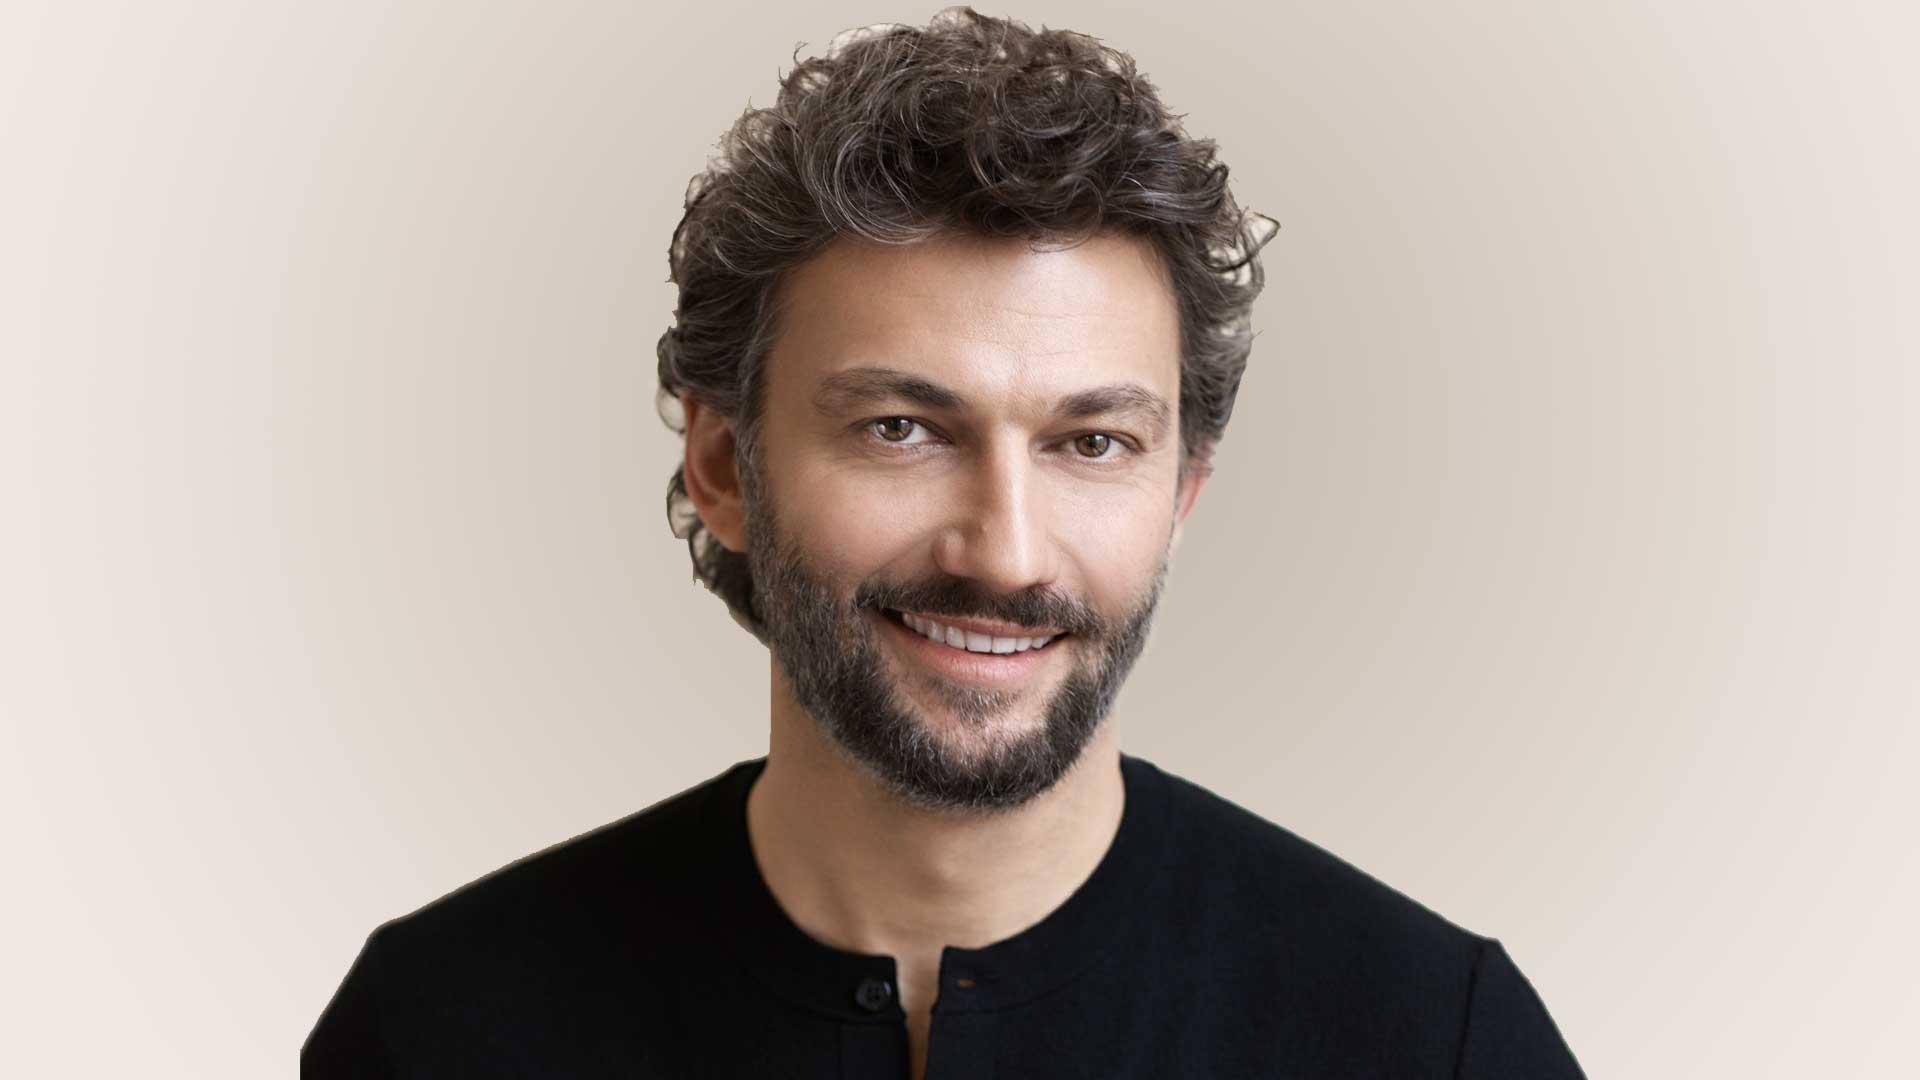 JONAS KAUFMANN - MY ITALY